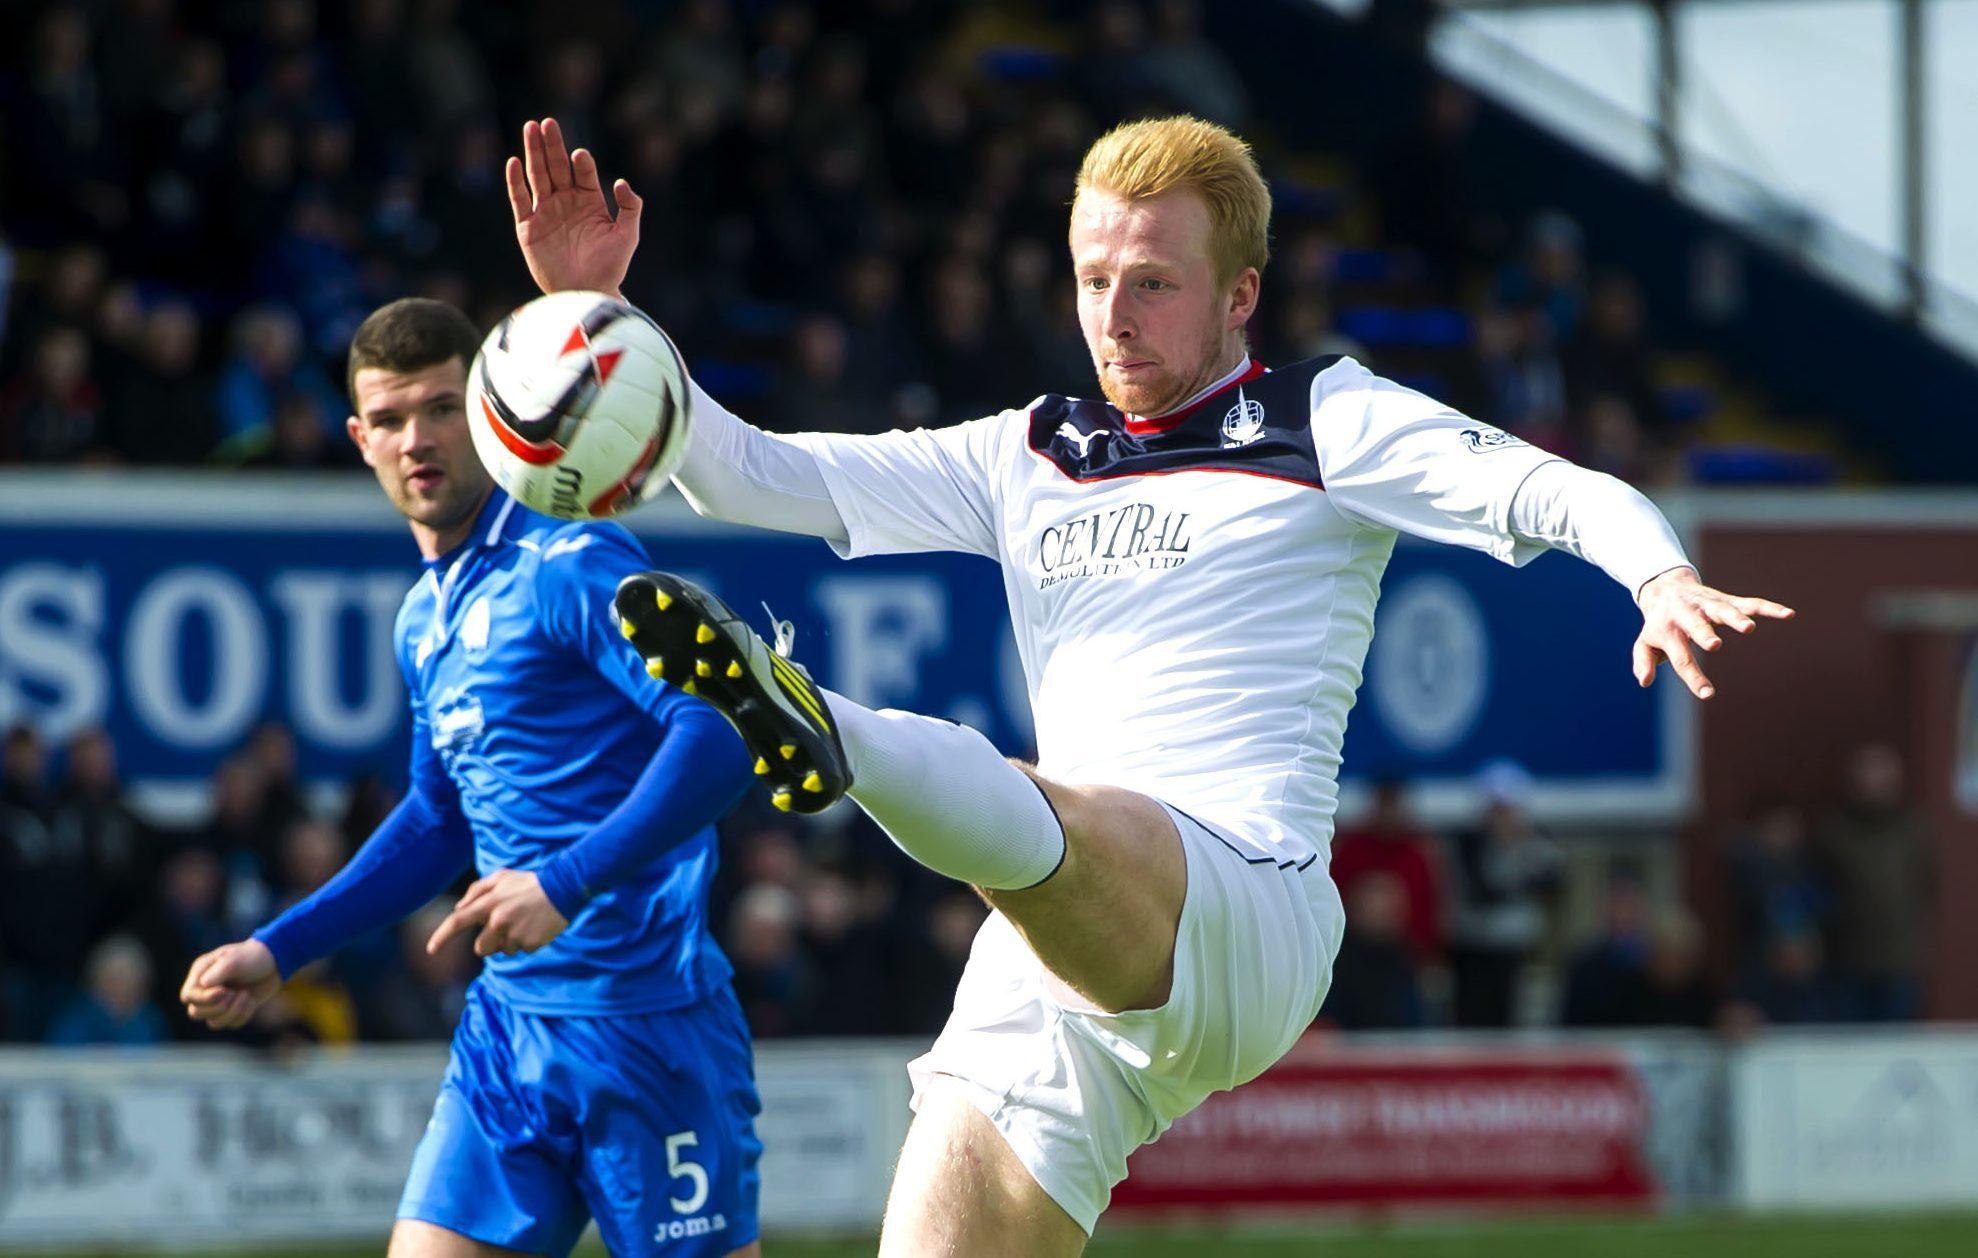 Mark Beck in action for Falkirk.